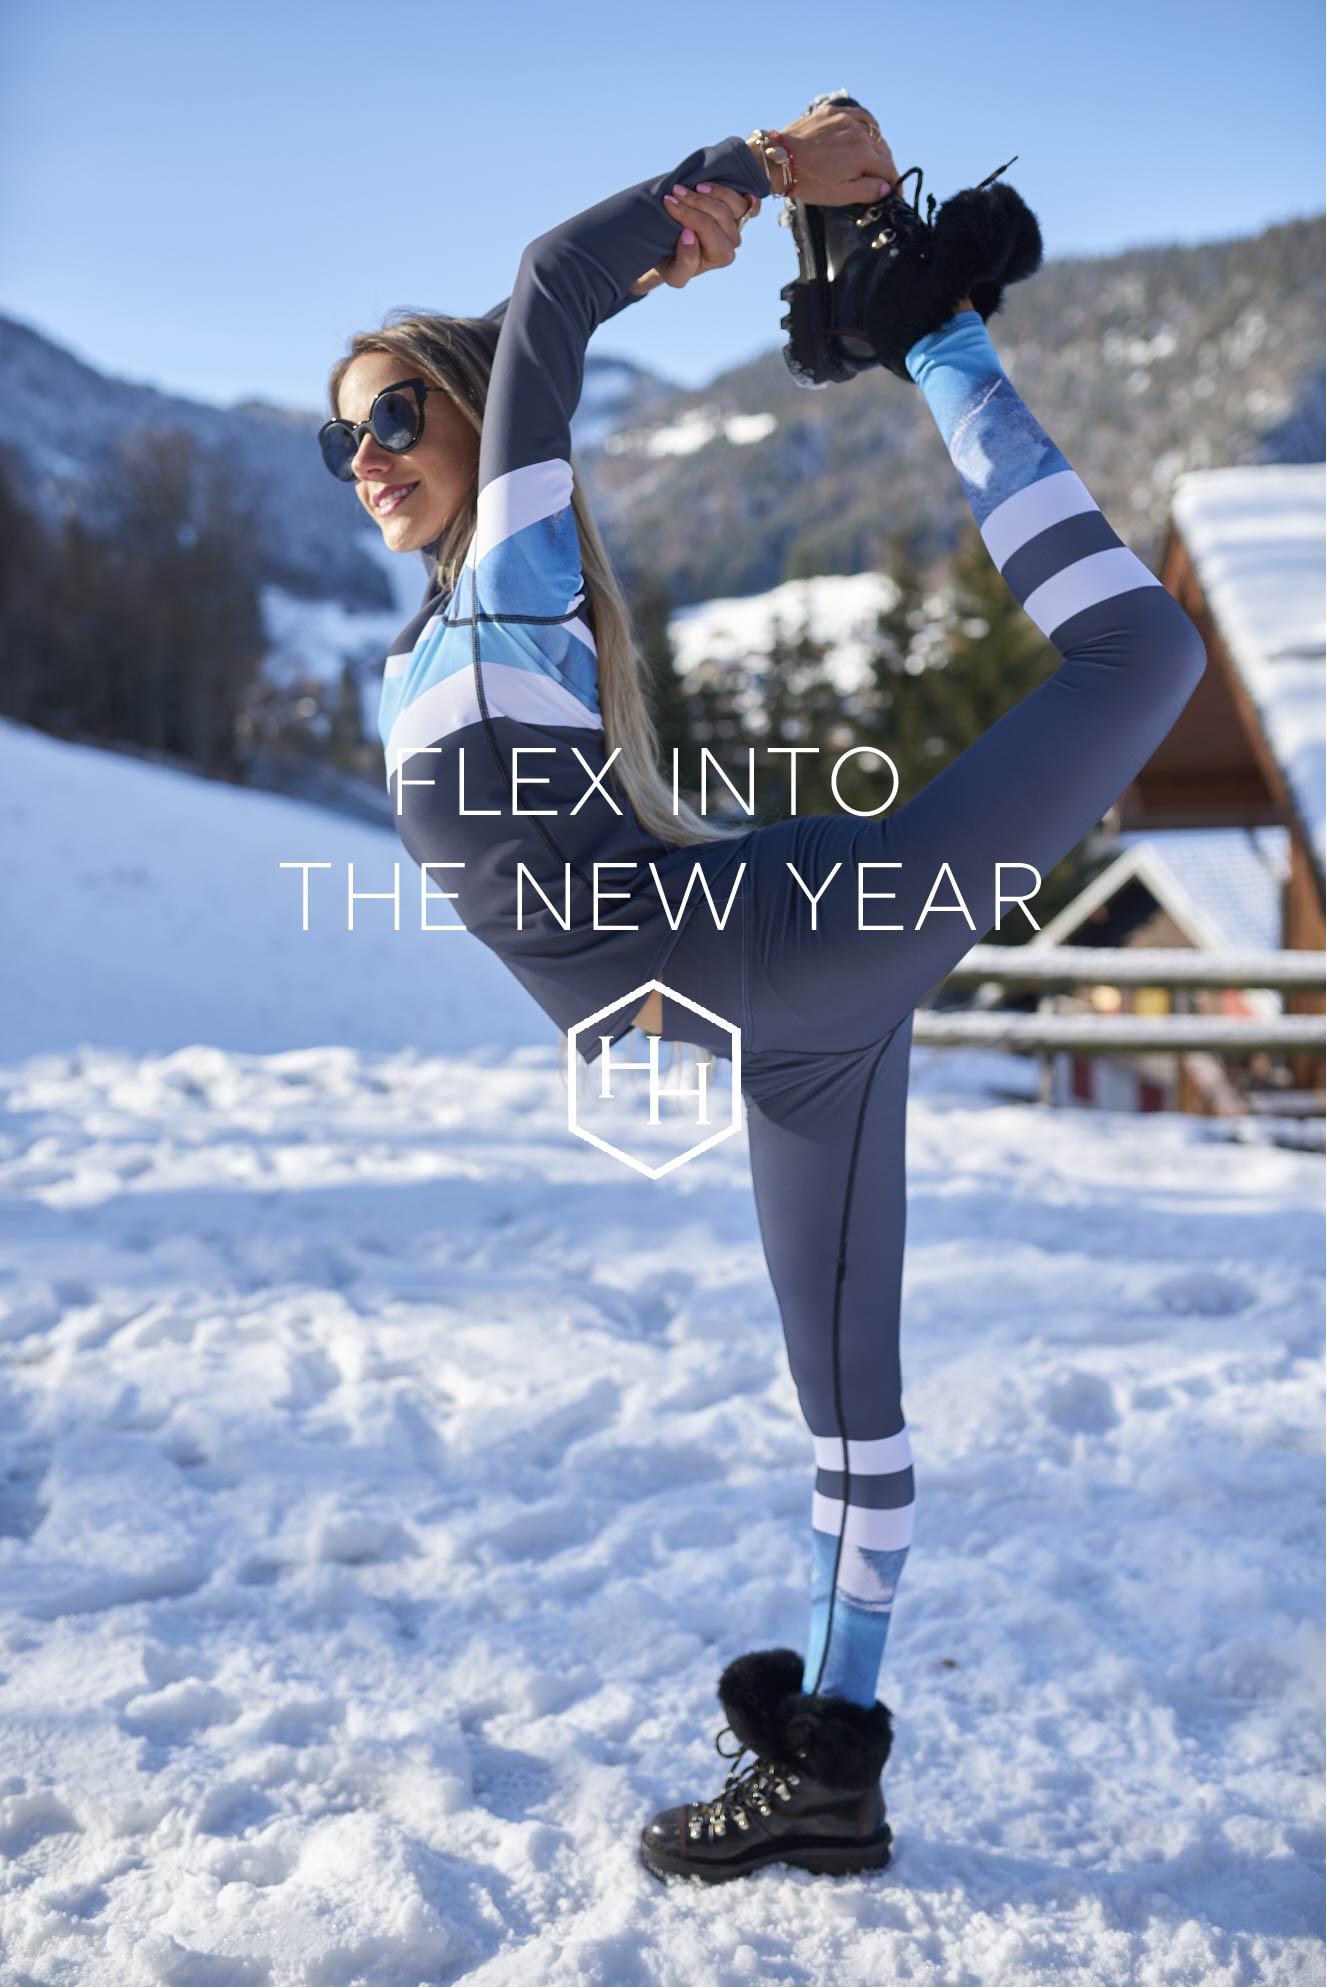 Flex into the new year4 .jpg